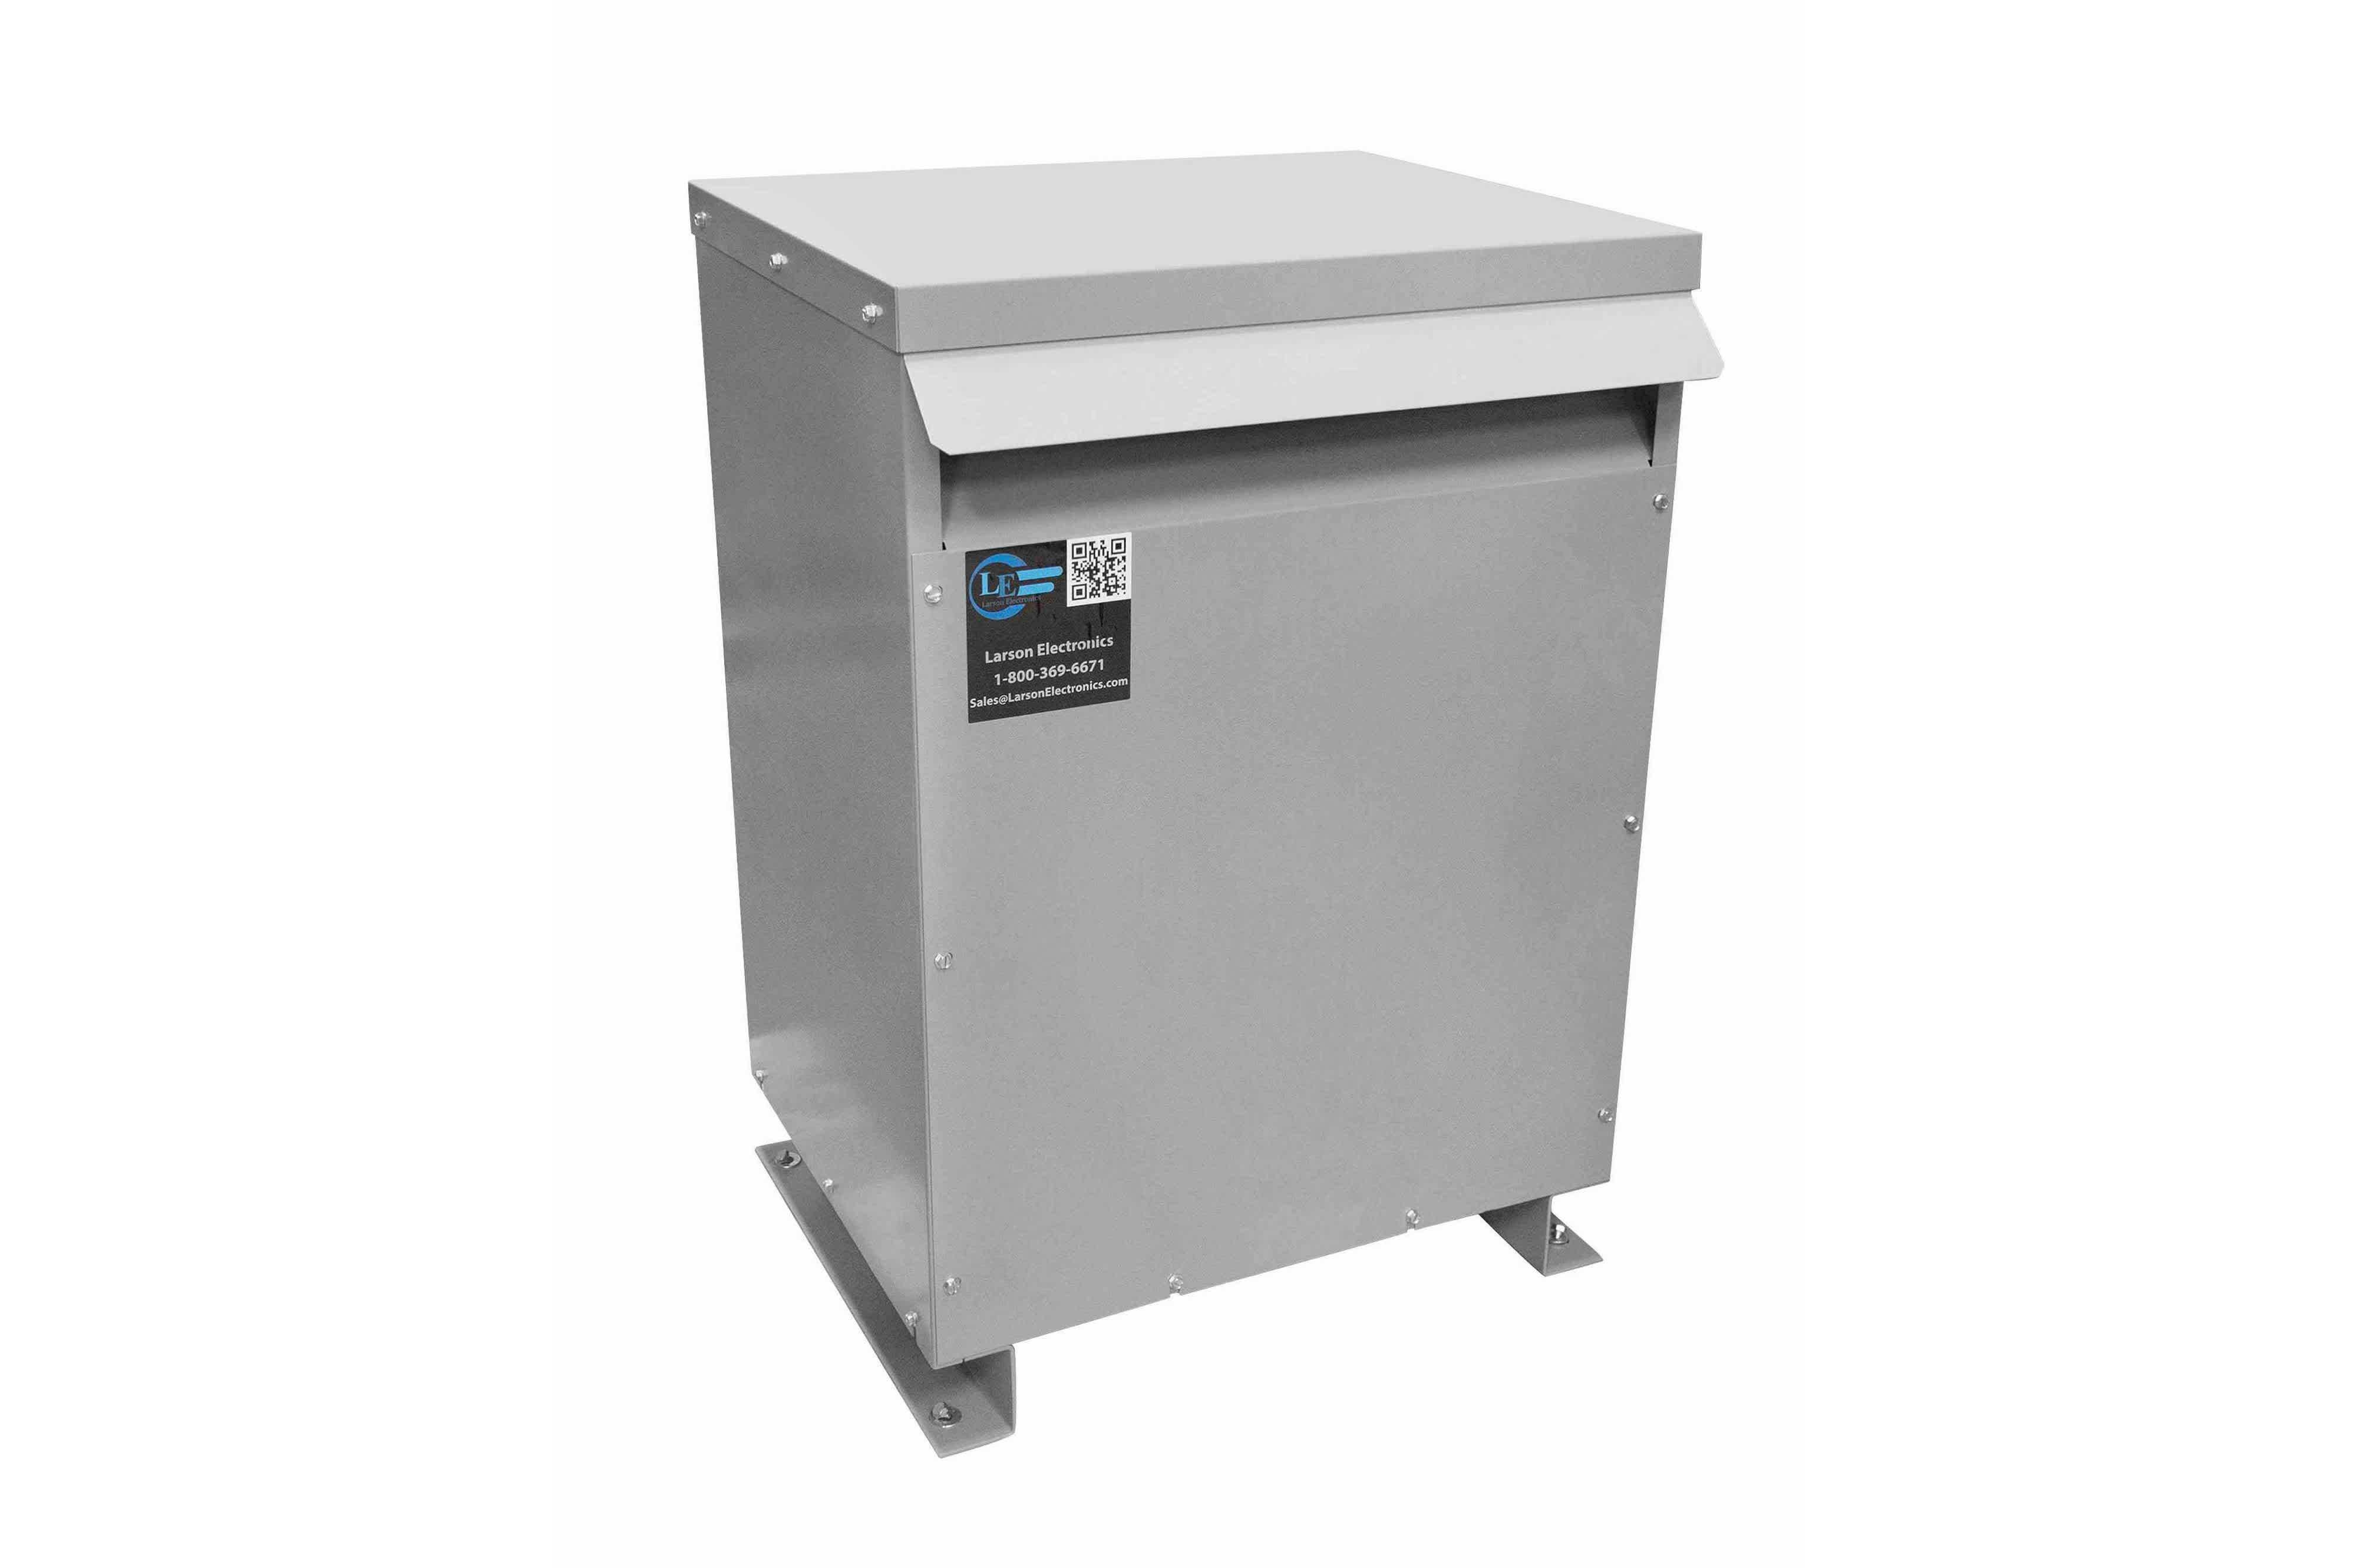 10 kVA 3PH Isolation Transformer, 380V Wye Primary, 600V Delta Secondary, N3R, Ventilated, 60 Hz